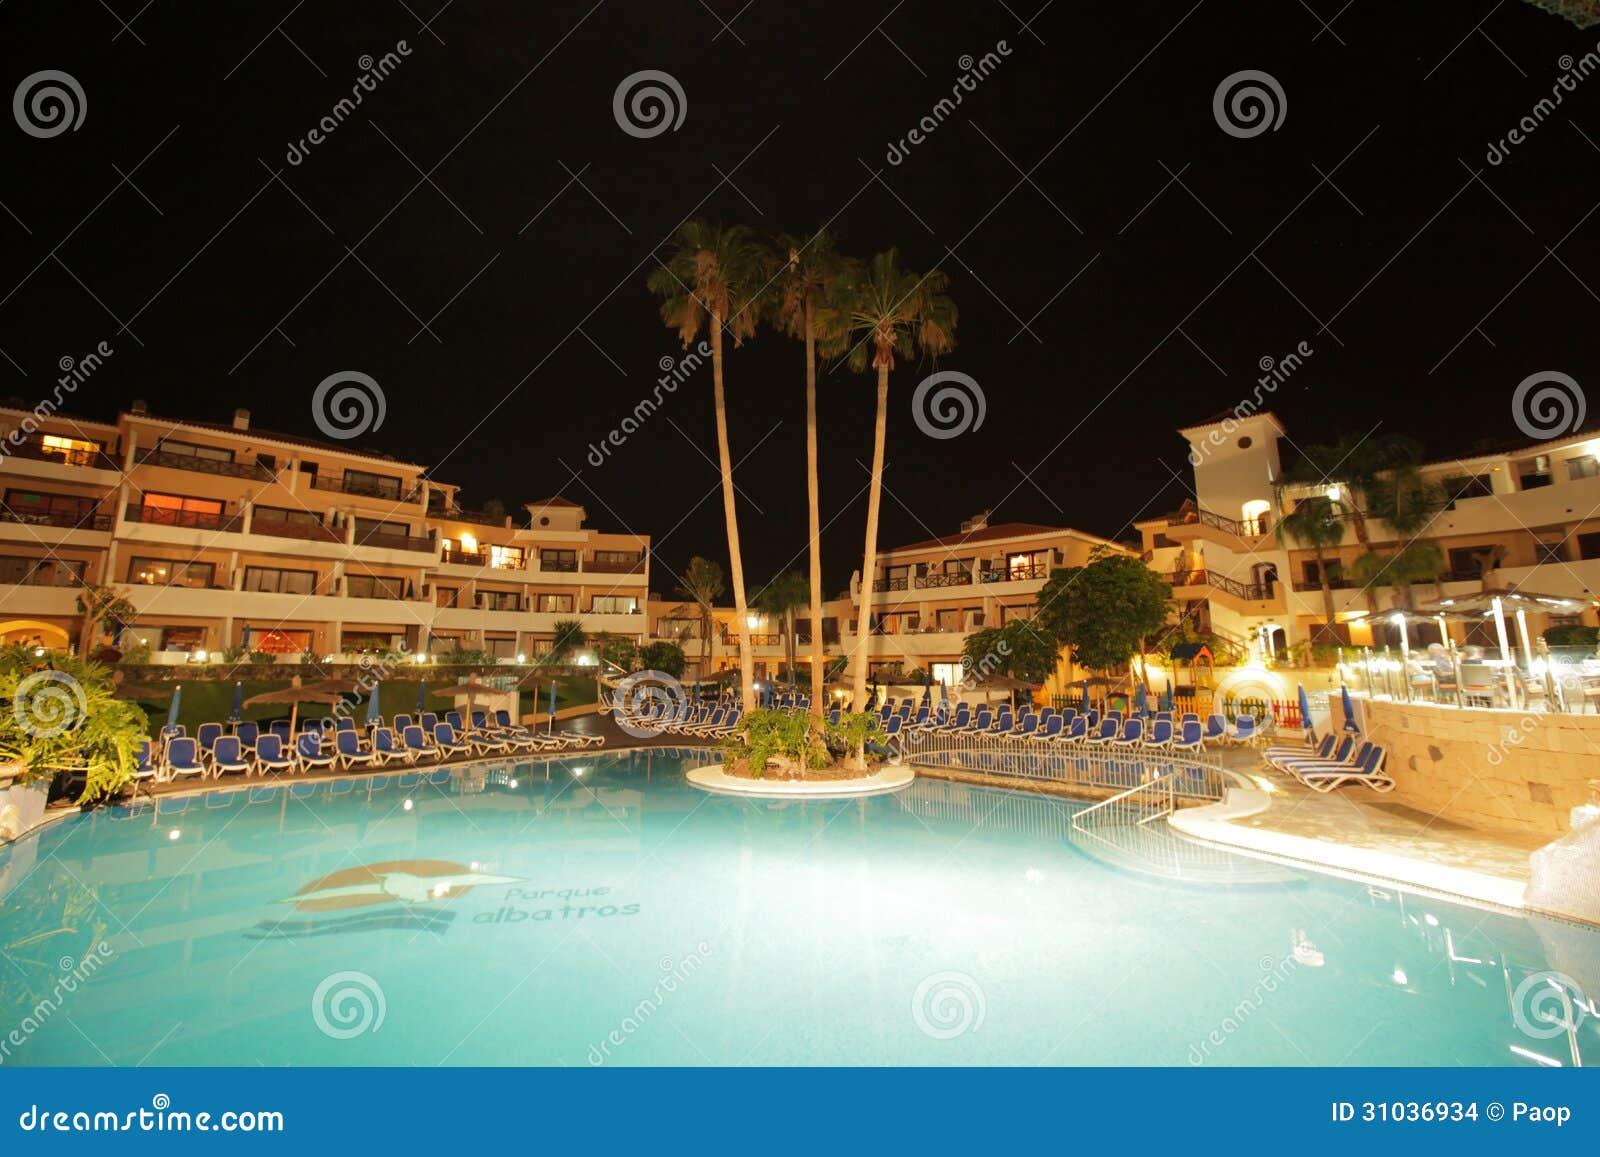 luxury hotel tenerife Photo